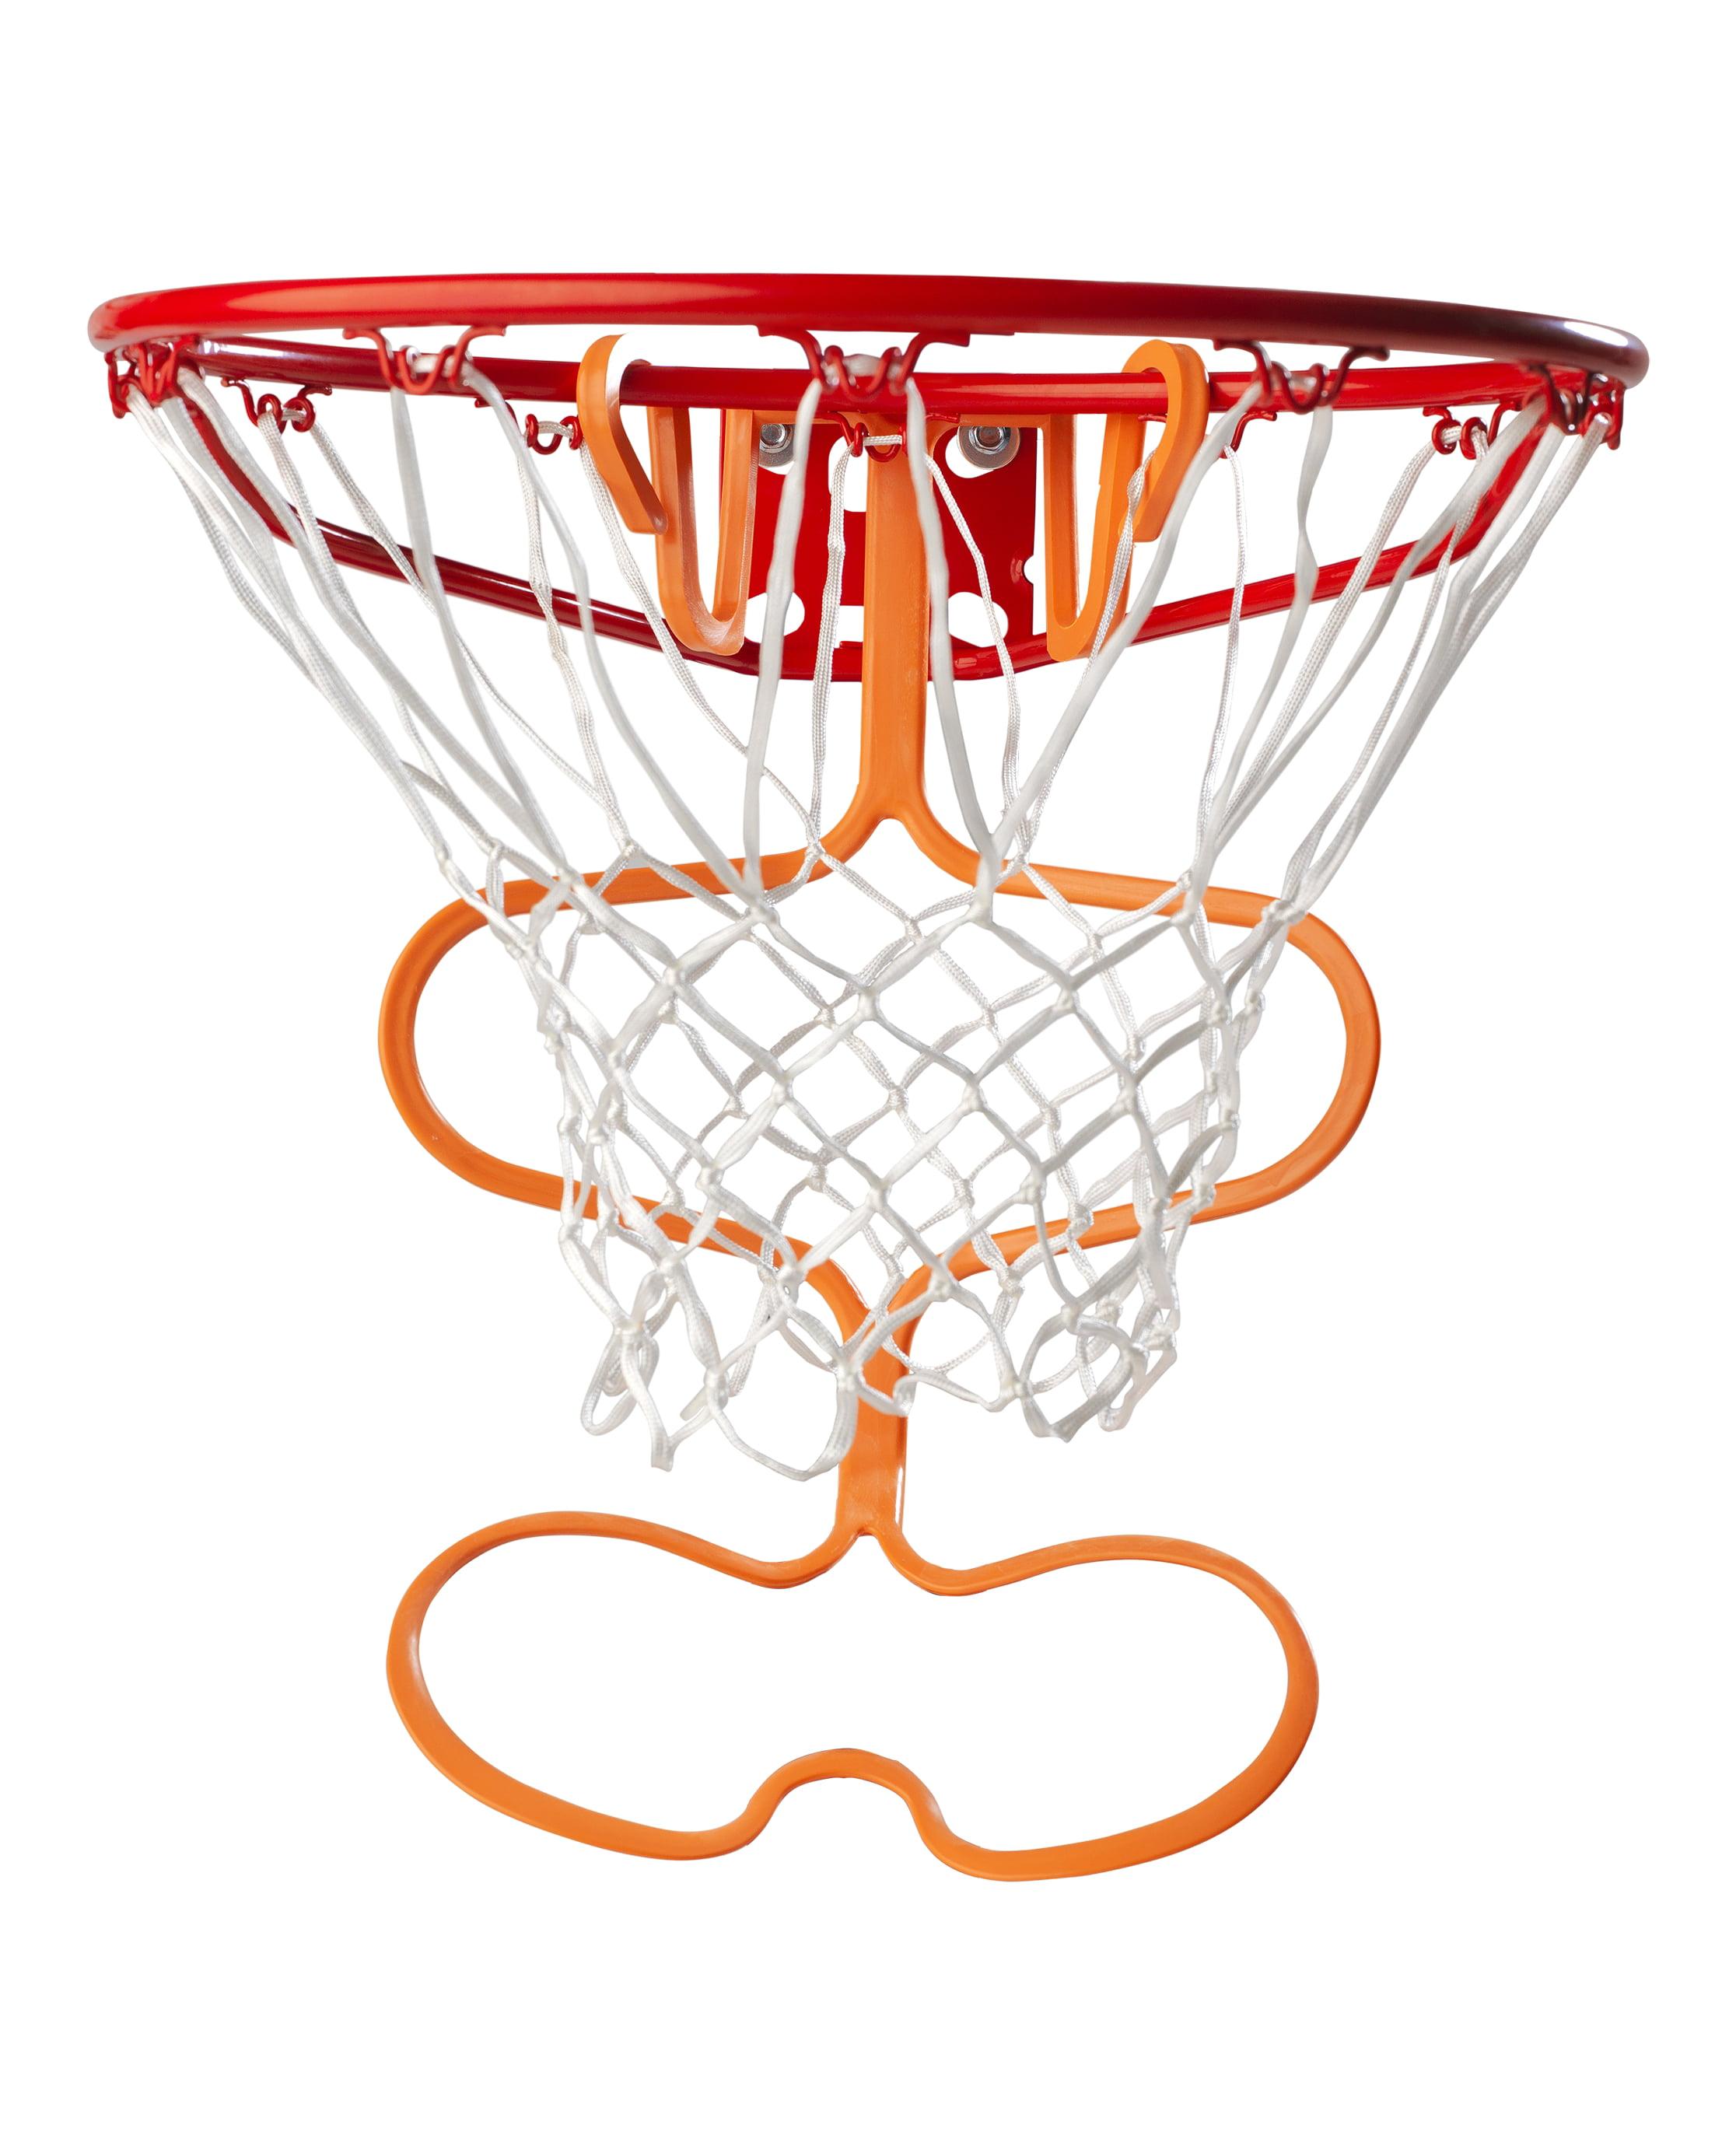 Spalding NBA Ball Return- Orange by Spalding